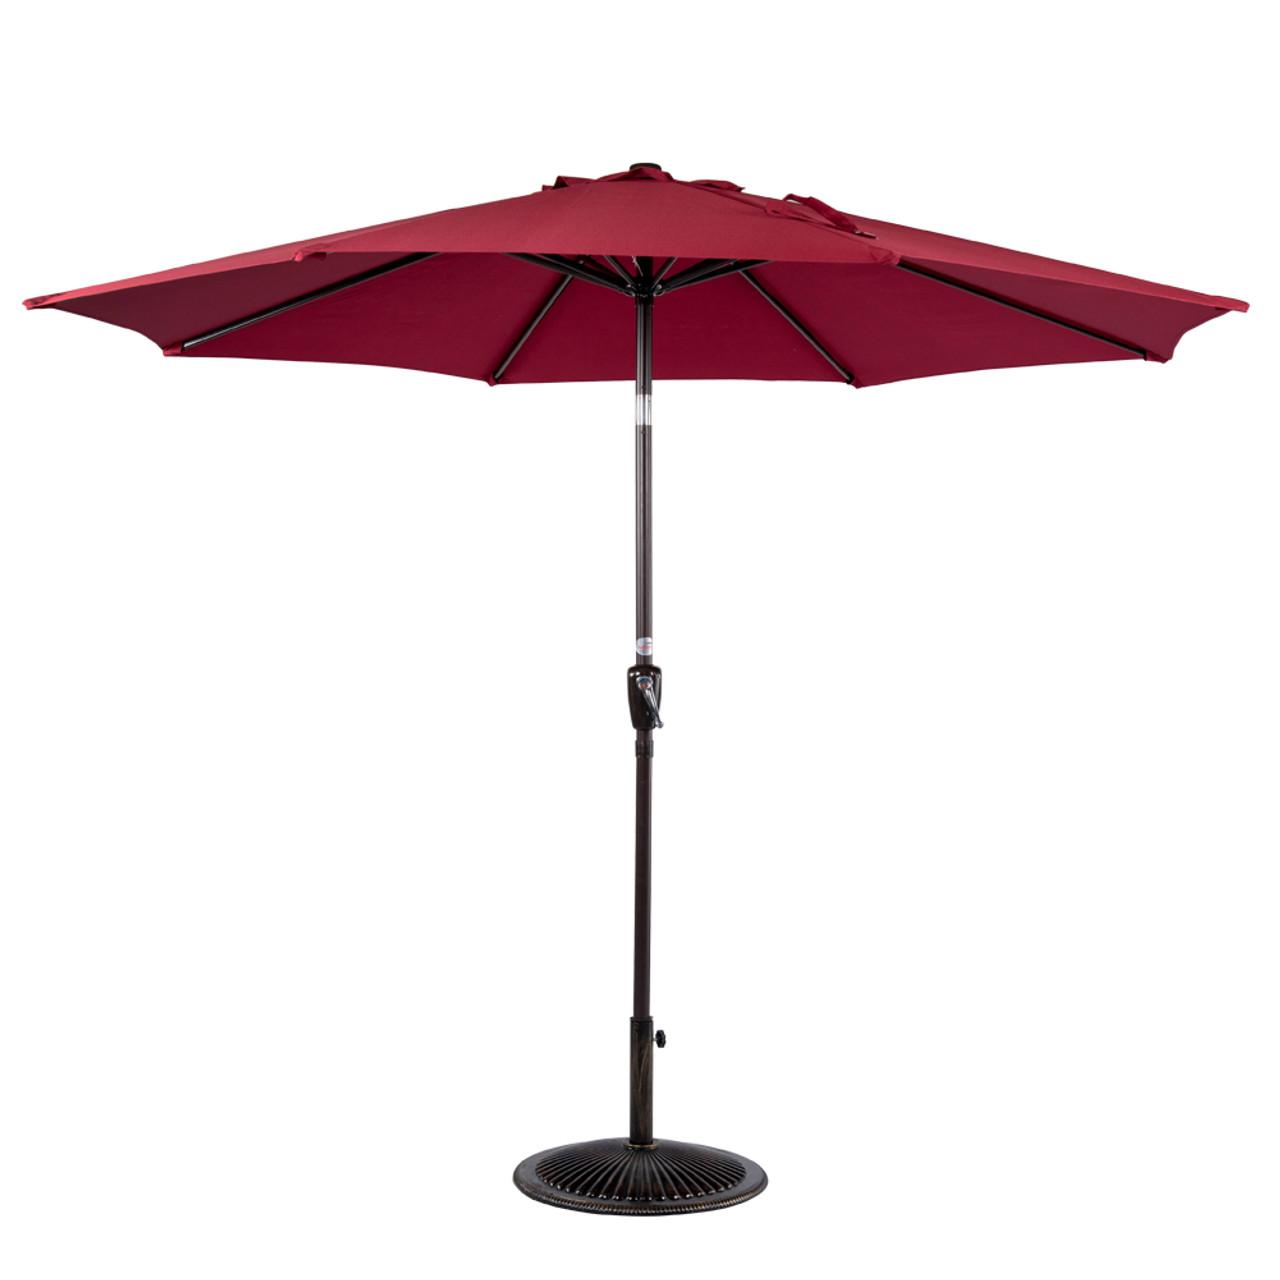 9 Feet Outdoor Aluminum Patio Umbrella With Auto Tilt And Crank(Burgundy)